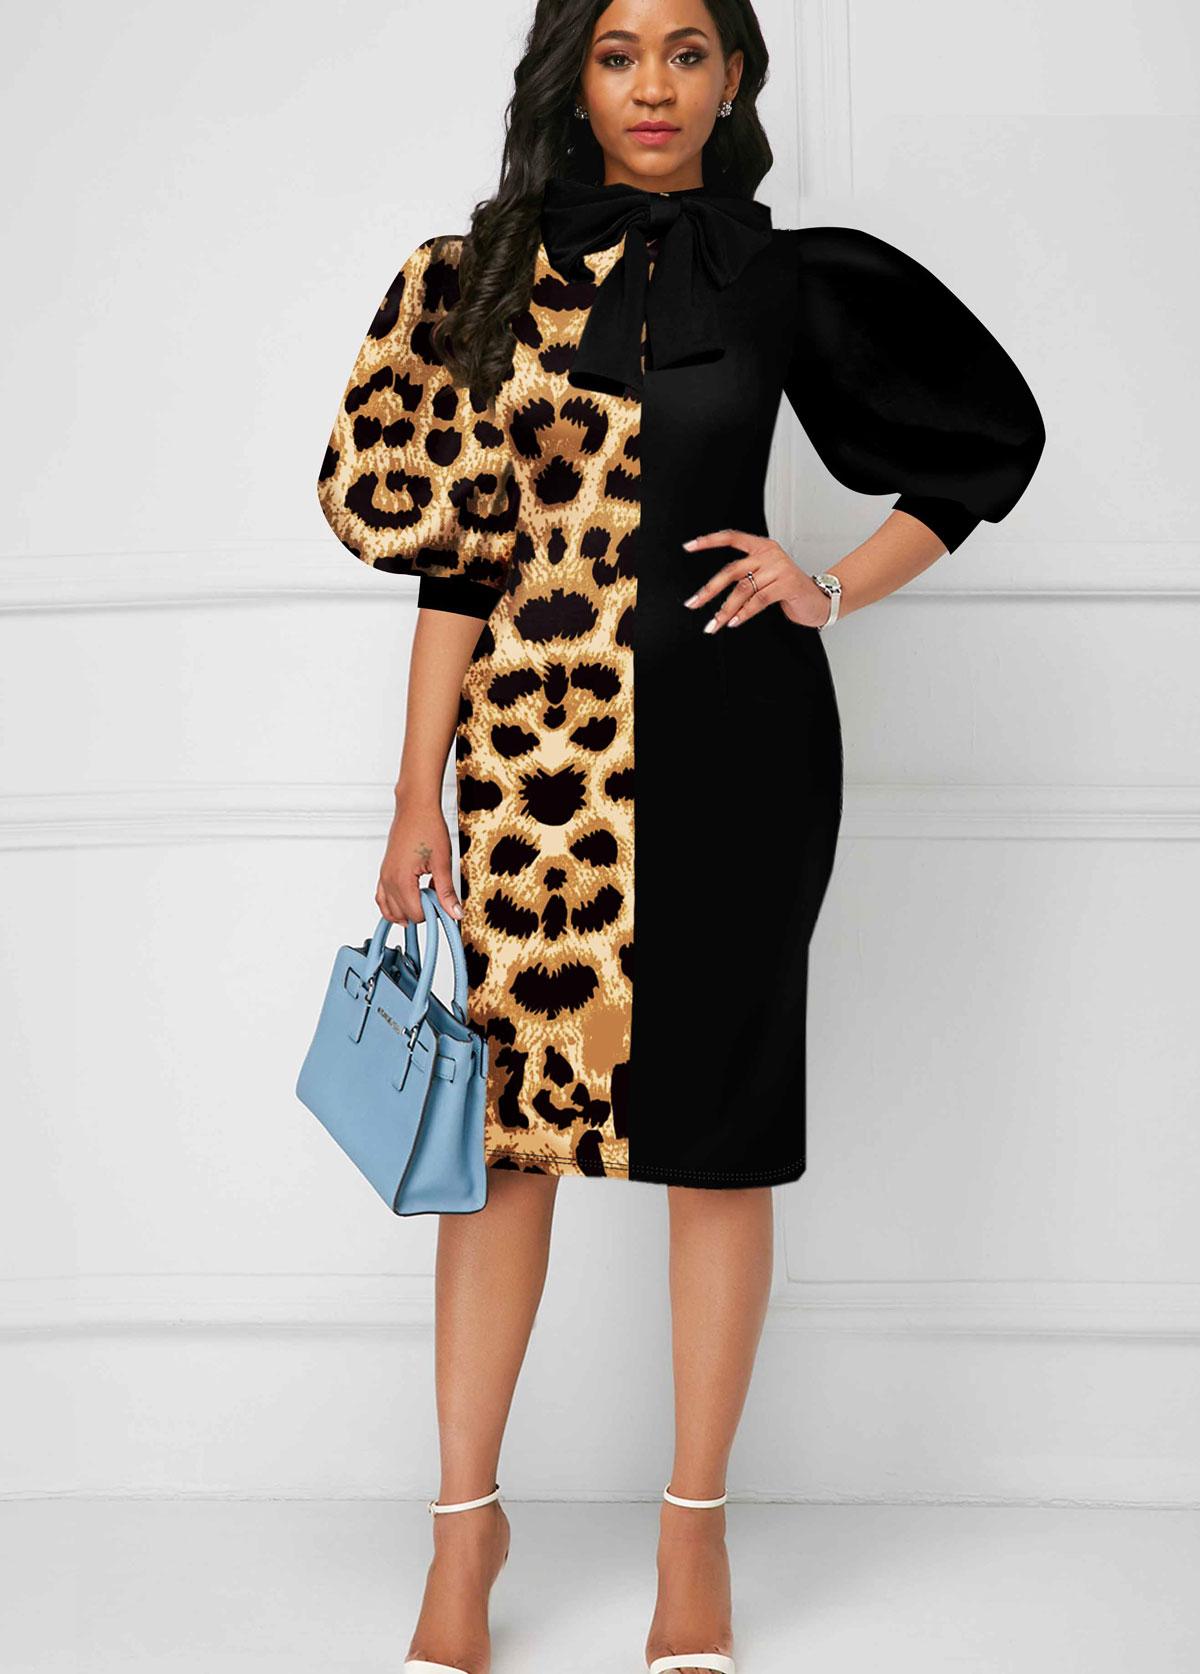 ROTITA Puff Sleeve Color Block Bowknot Leopard Dress